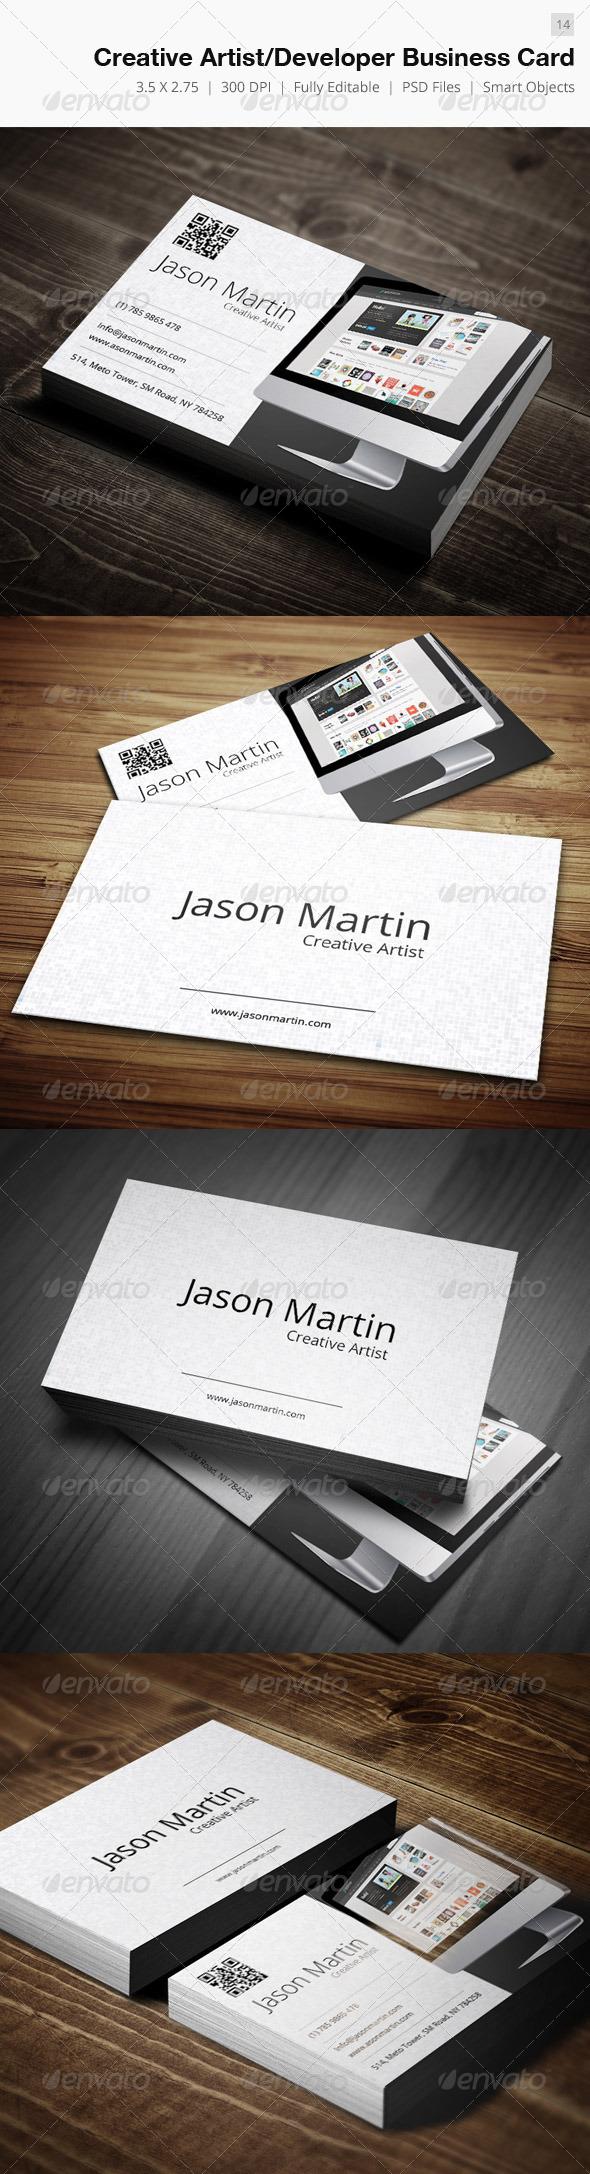 GraphicRiver Creative Artist Developer Business Card 14 4395624